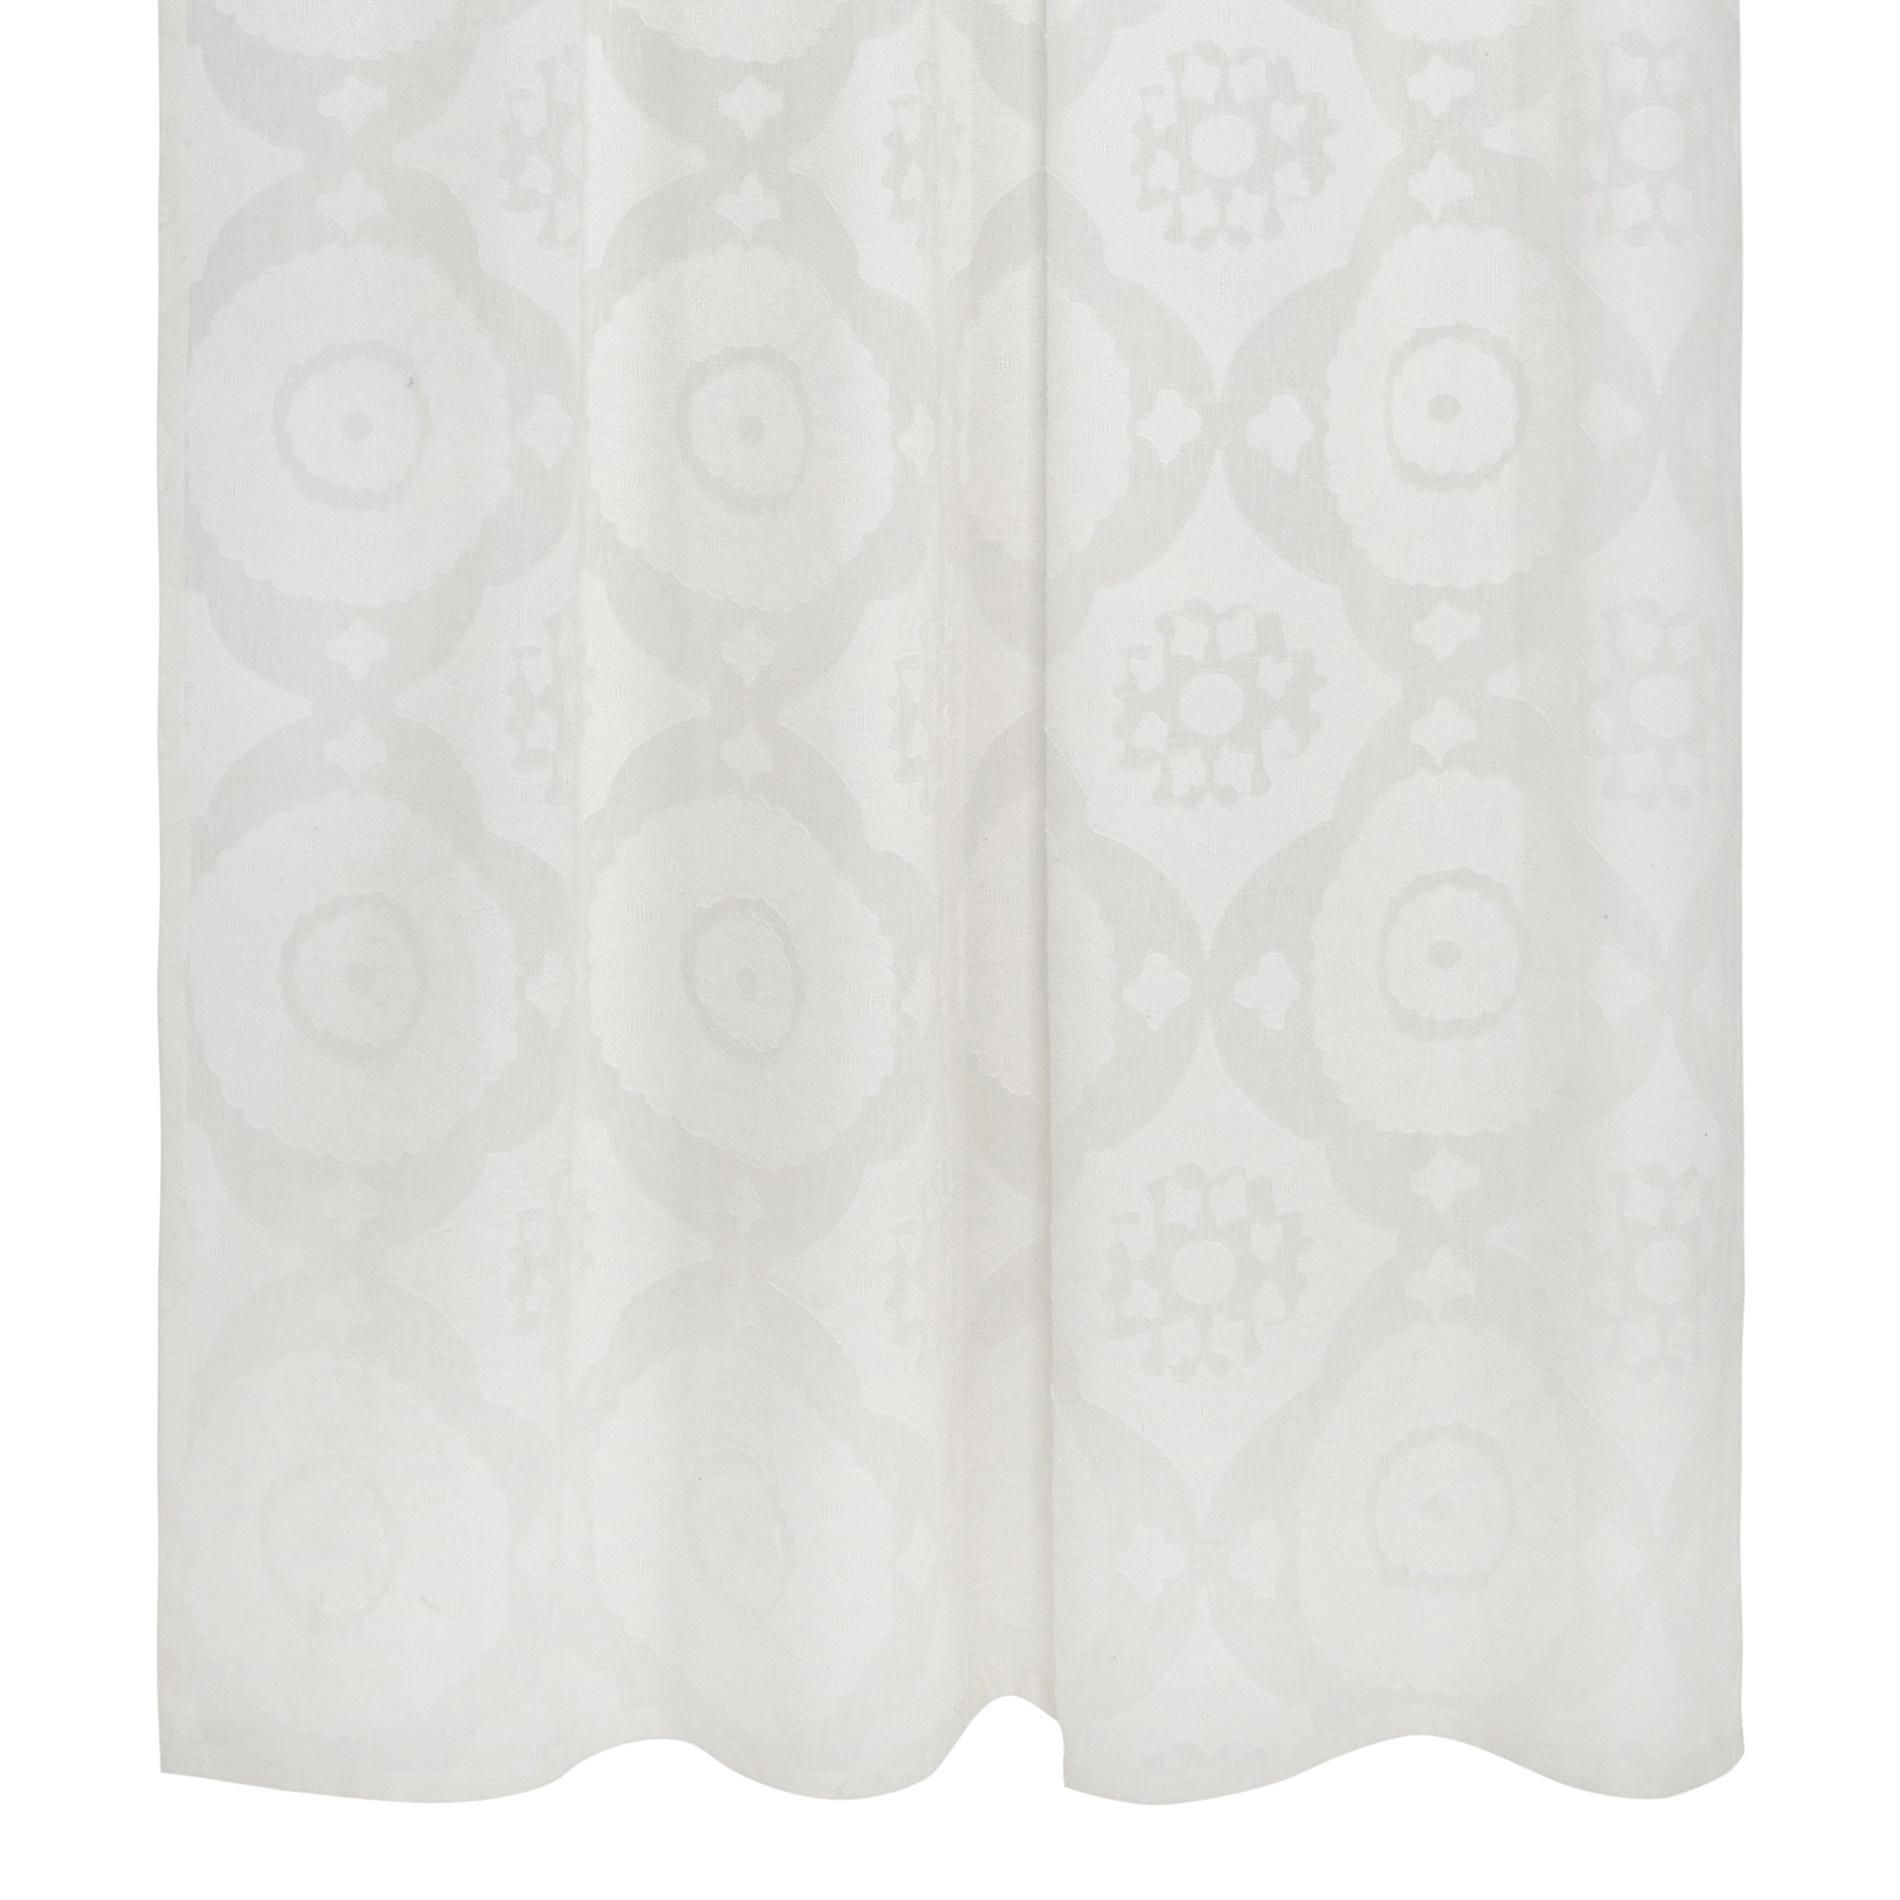 Tenda devore motivo geometrico passanti nascosti, Bianco, large image number 1